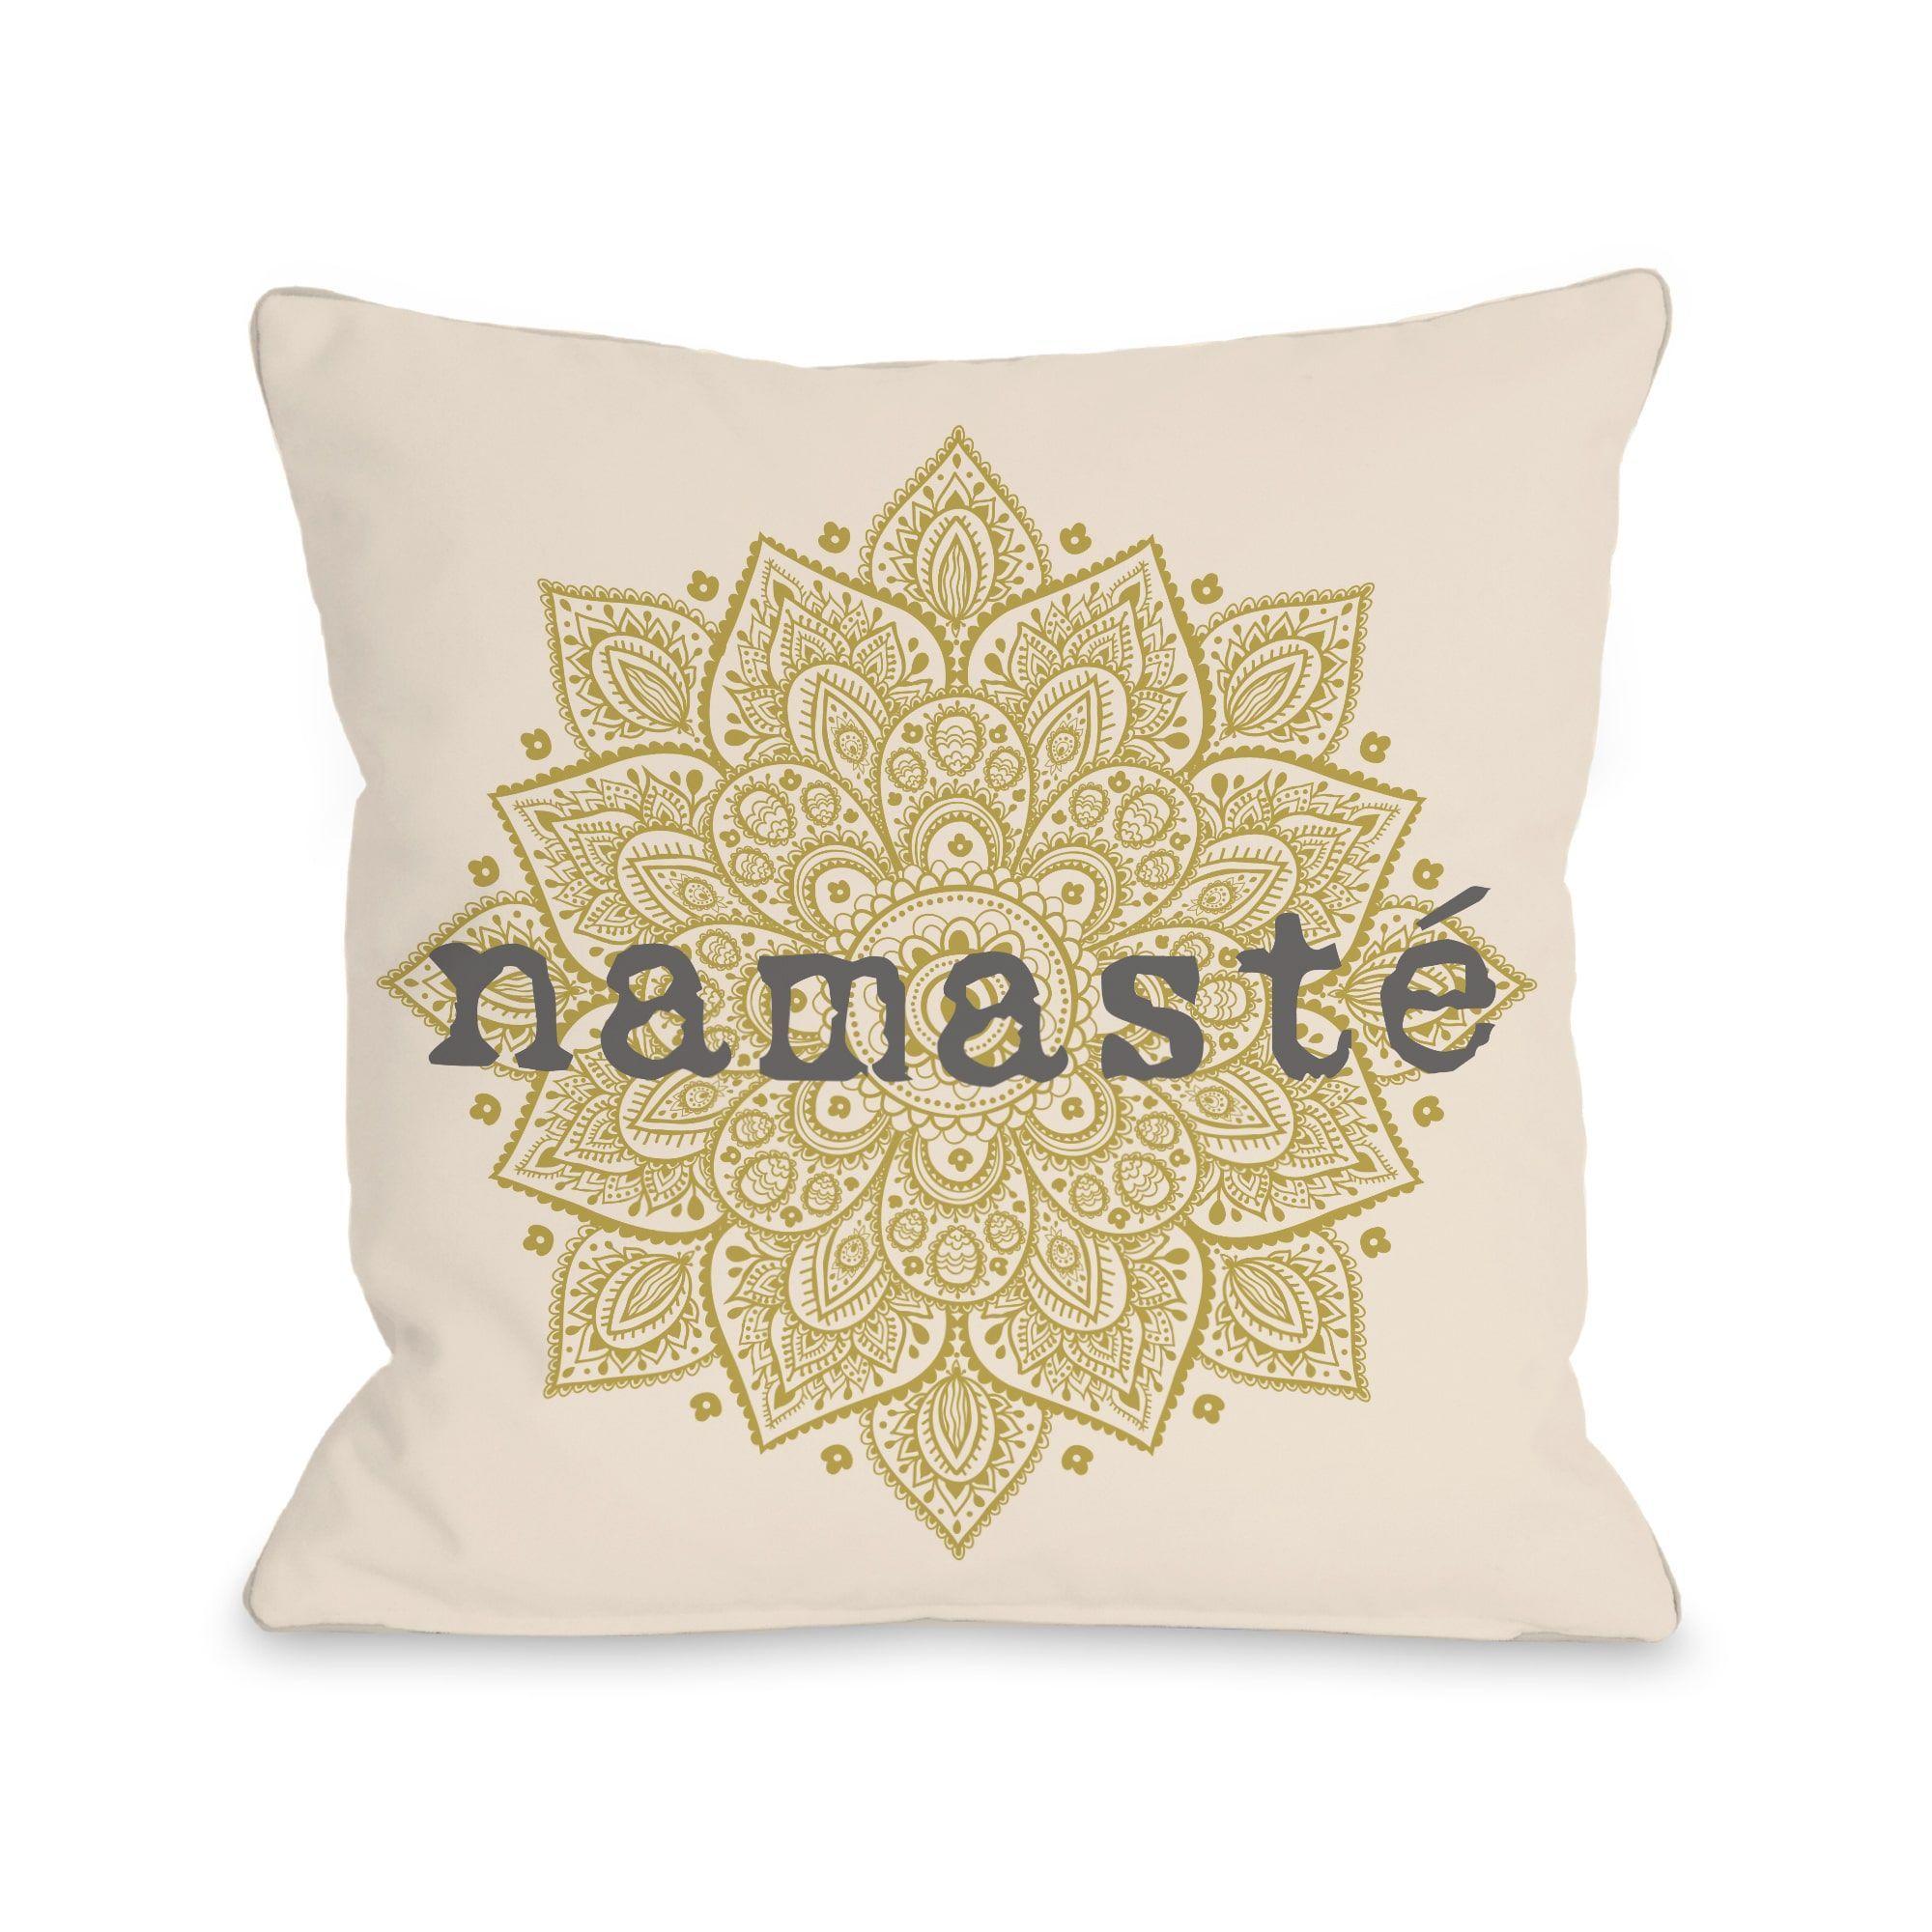 One bella casa namaste ivory oil yellow or inch throw pillow